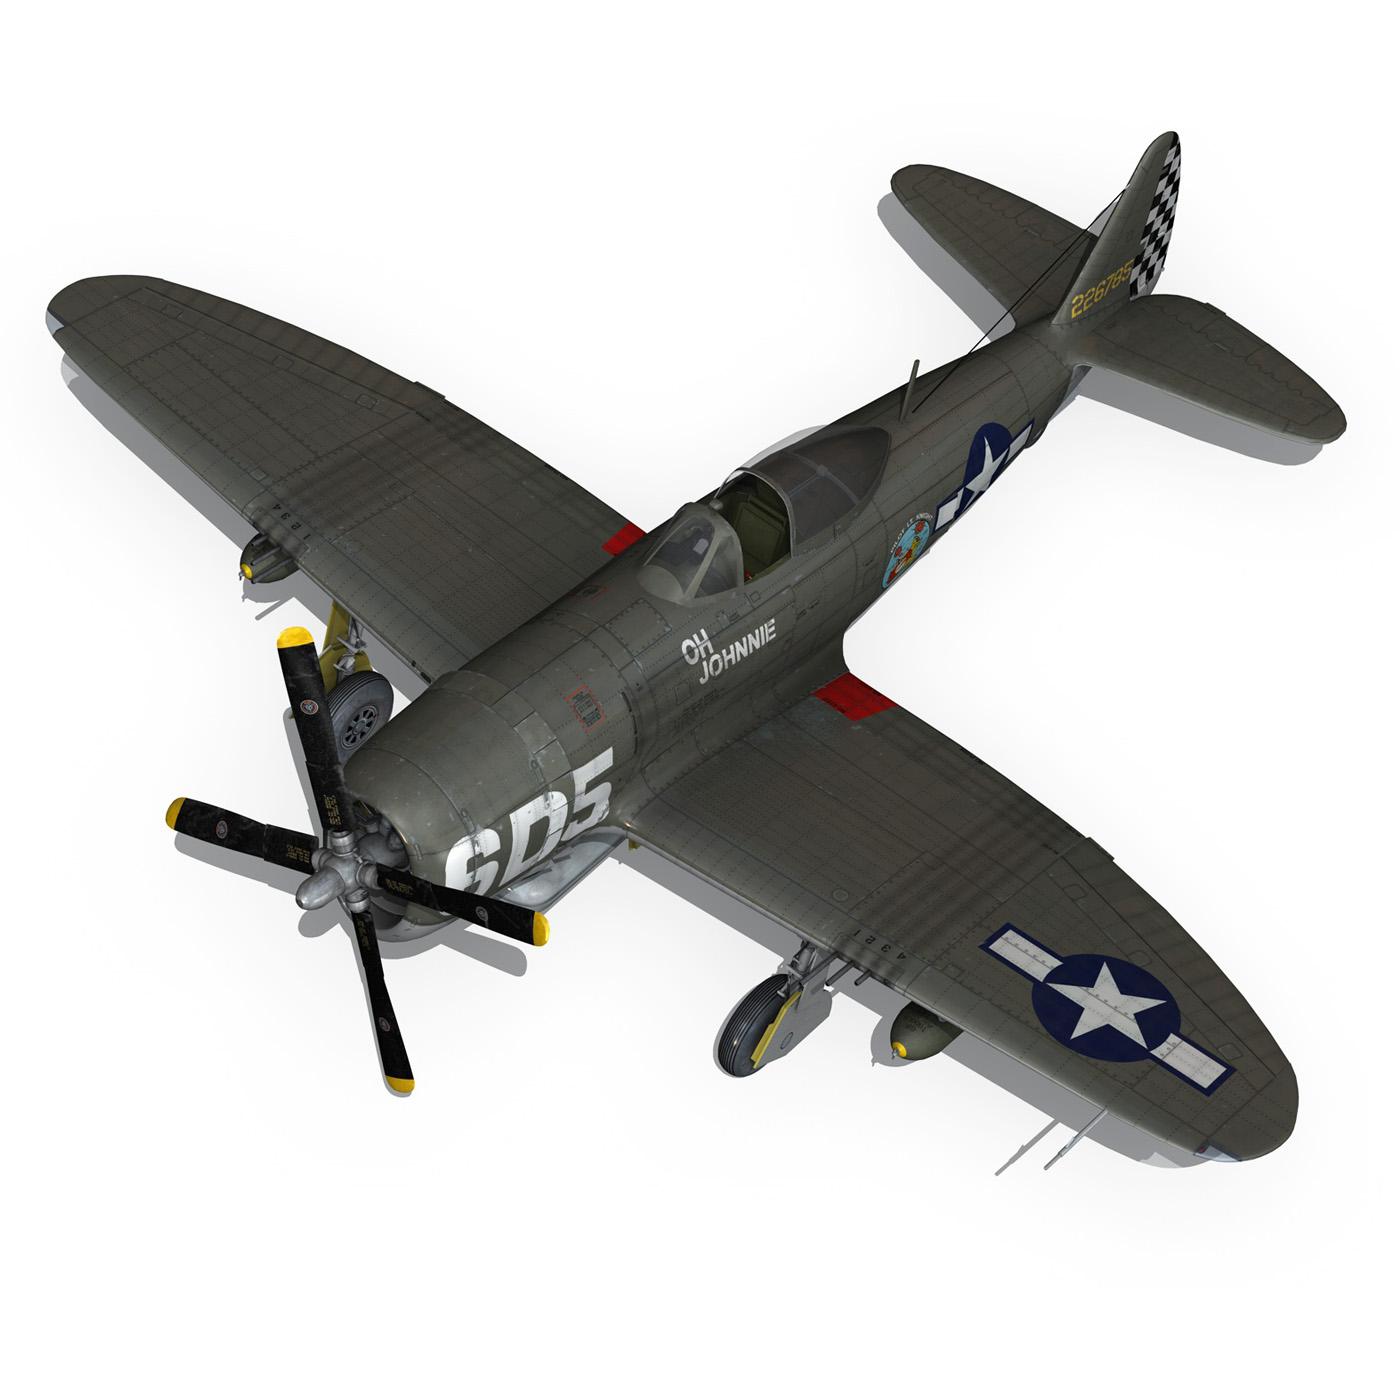 republic p-47 thunderbolt – oh johnnie 3d model fbx c4d lwo obj 274260